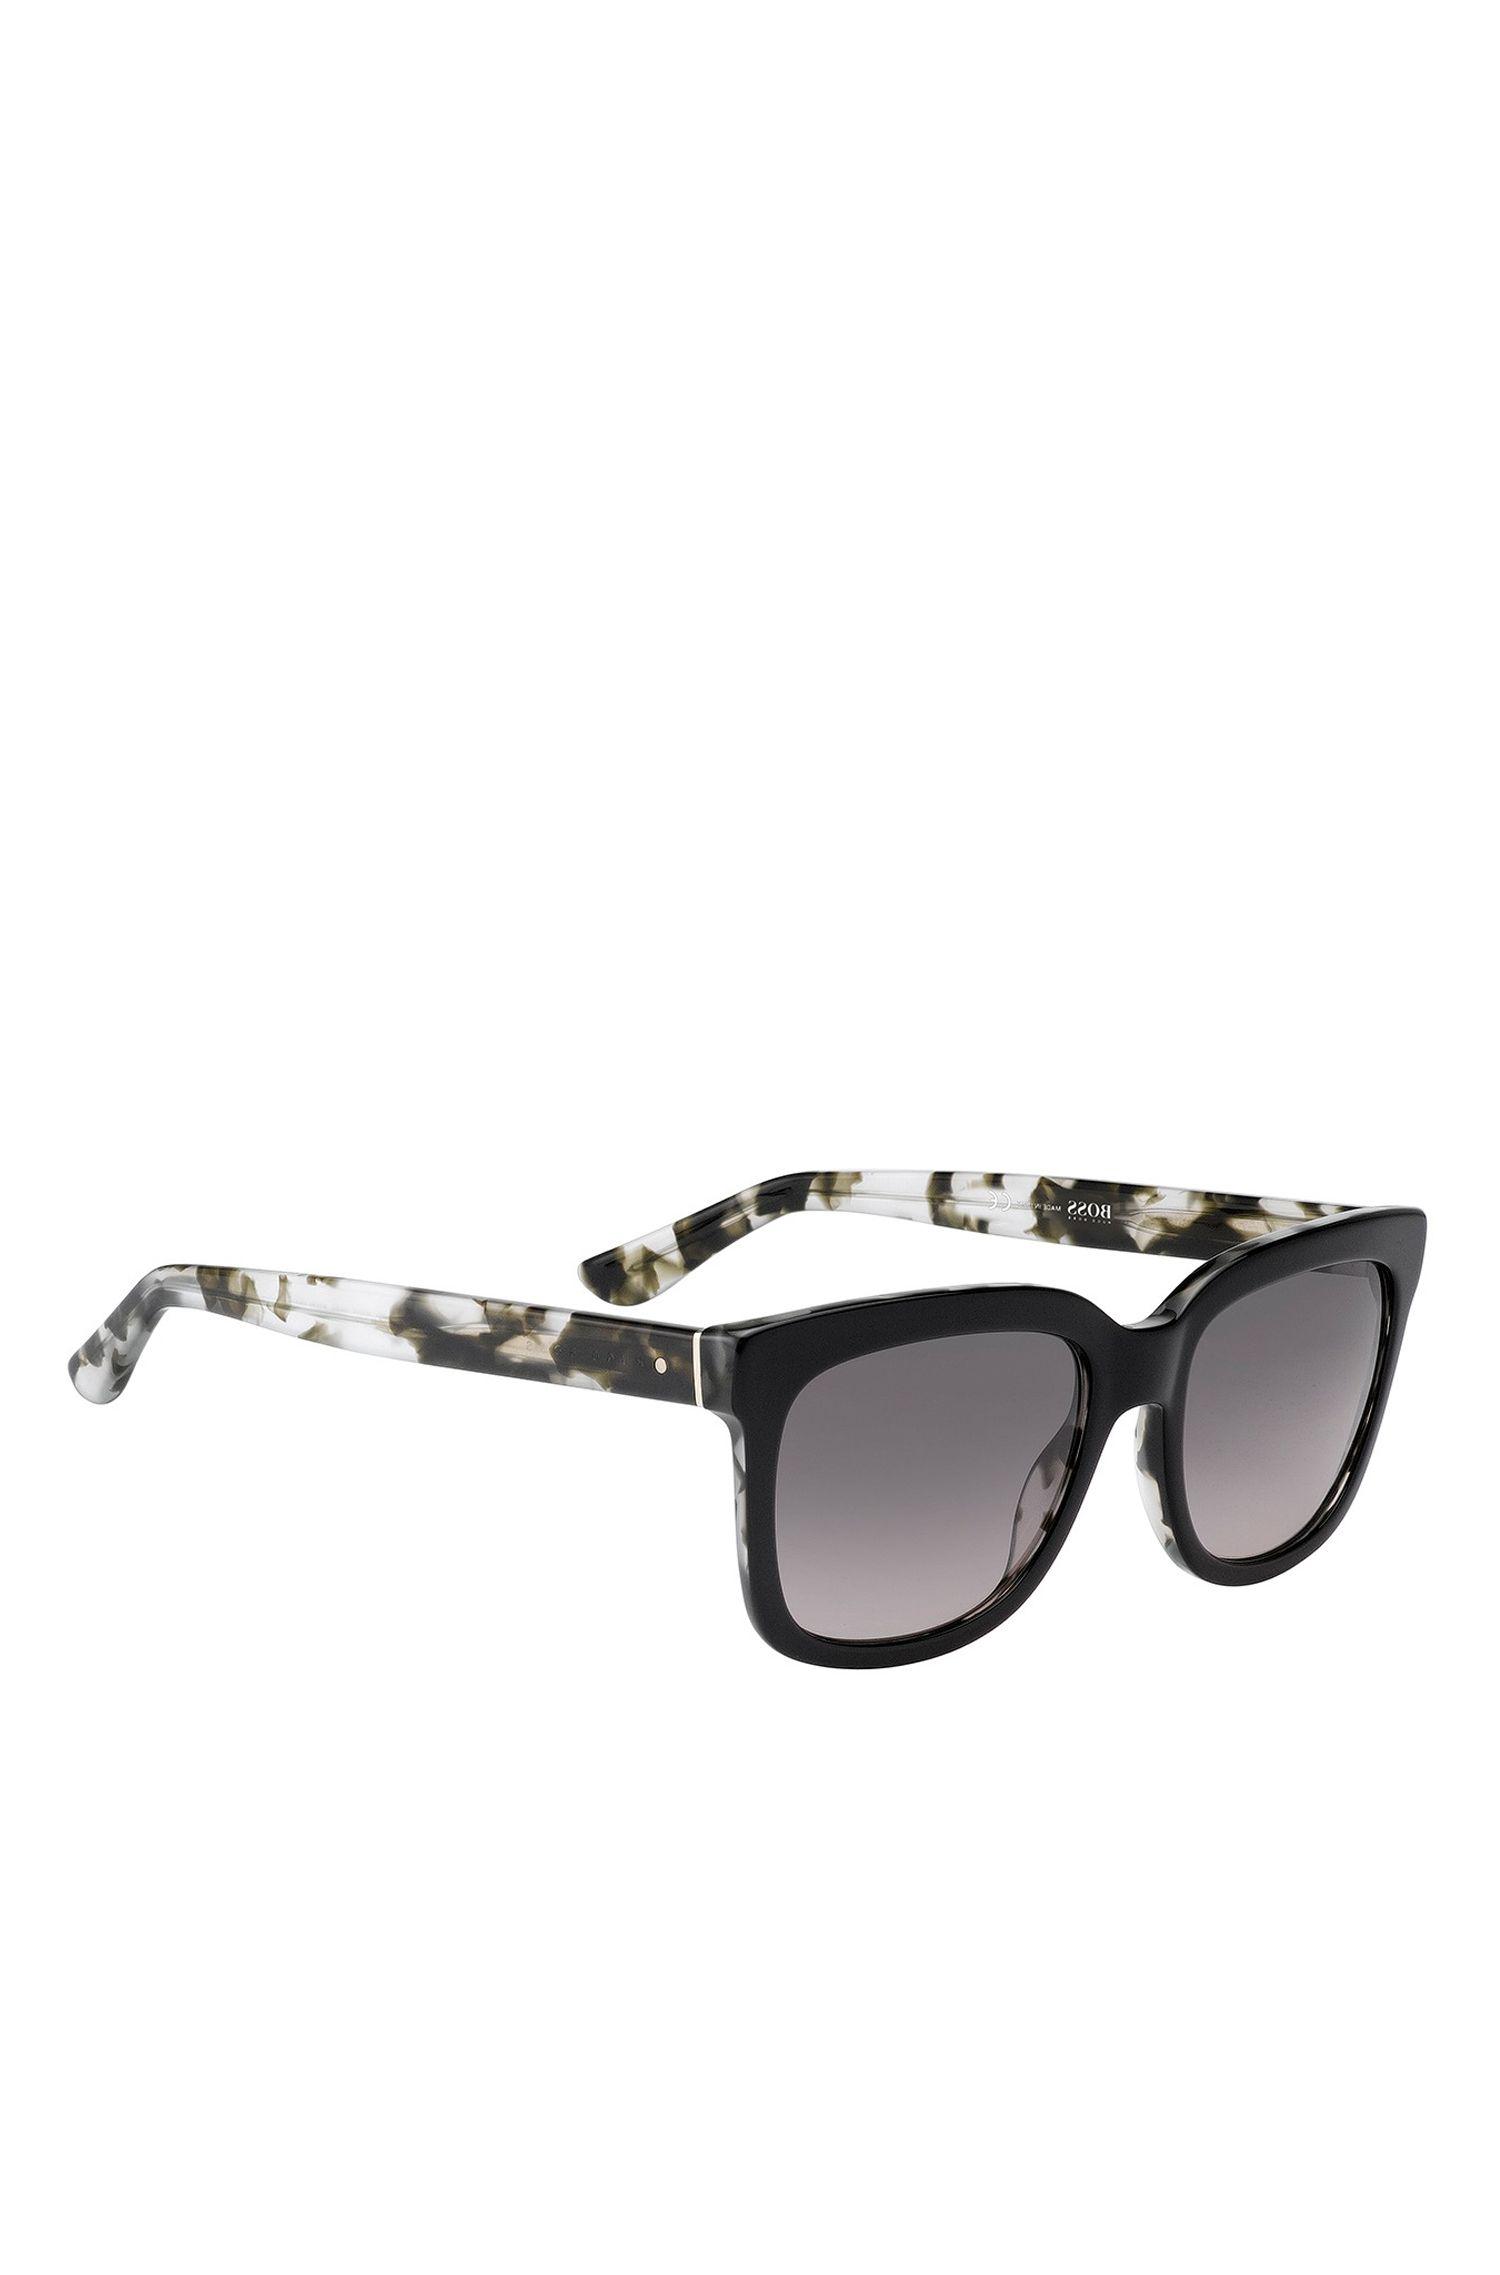 Gradient Lens Rectangular Sunglasses | BOSS 0741S, Assorted-Pre-Pack